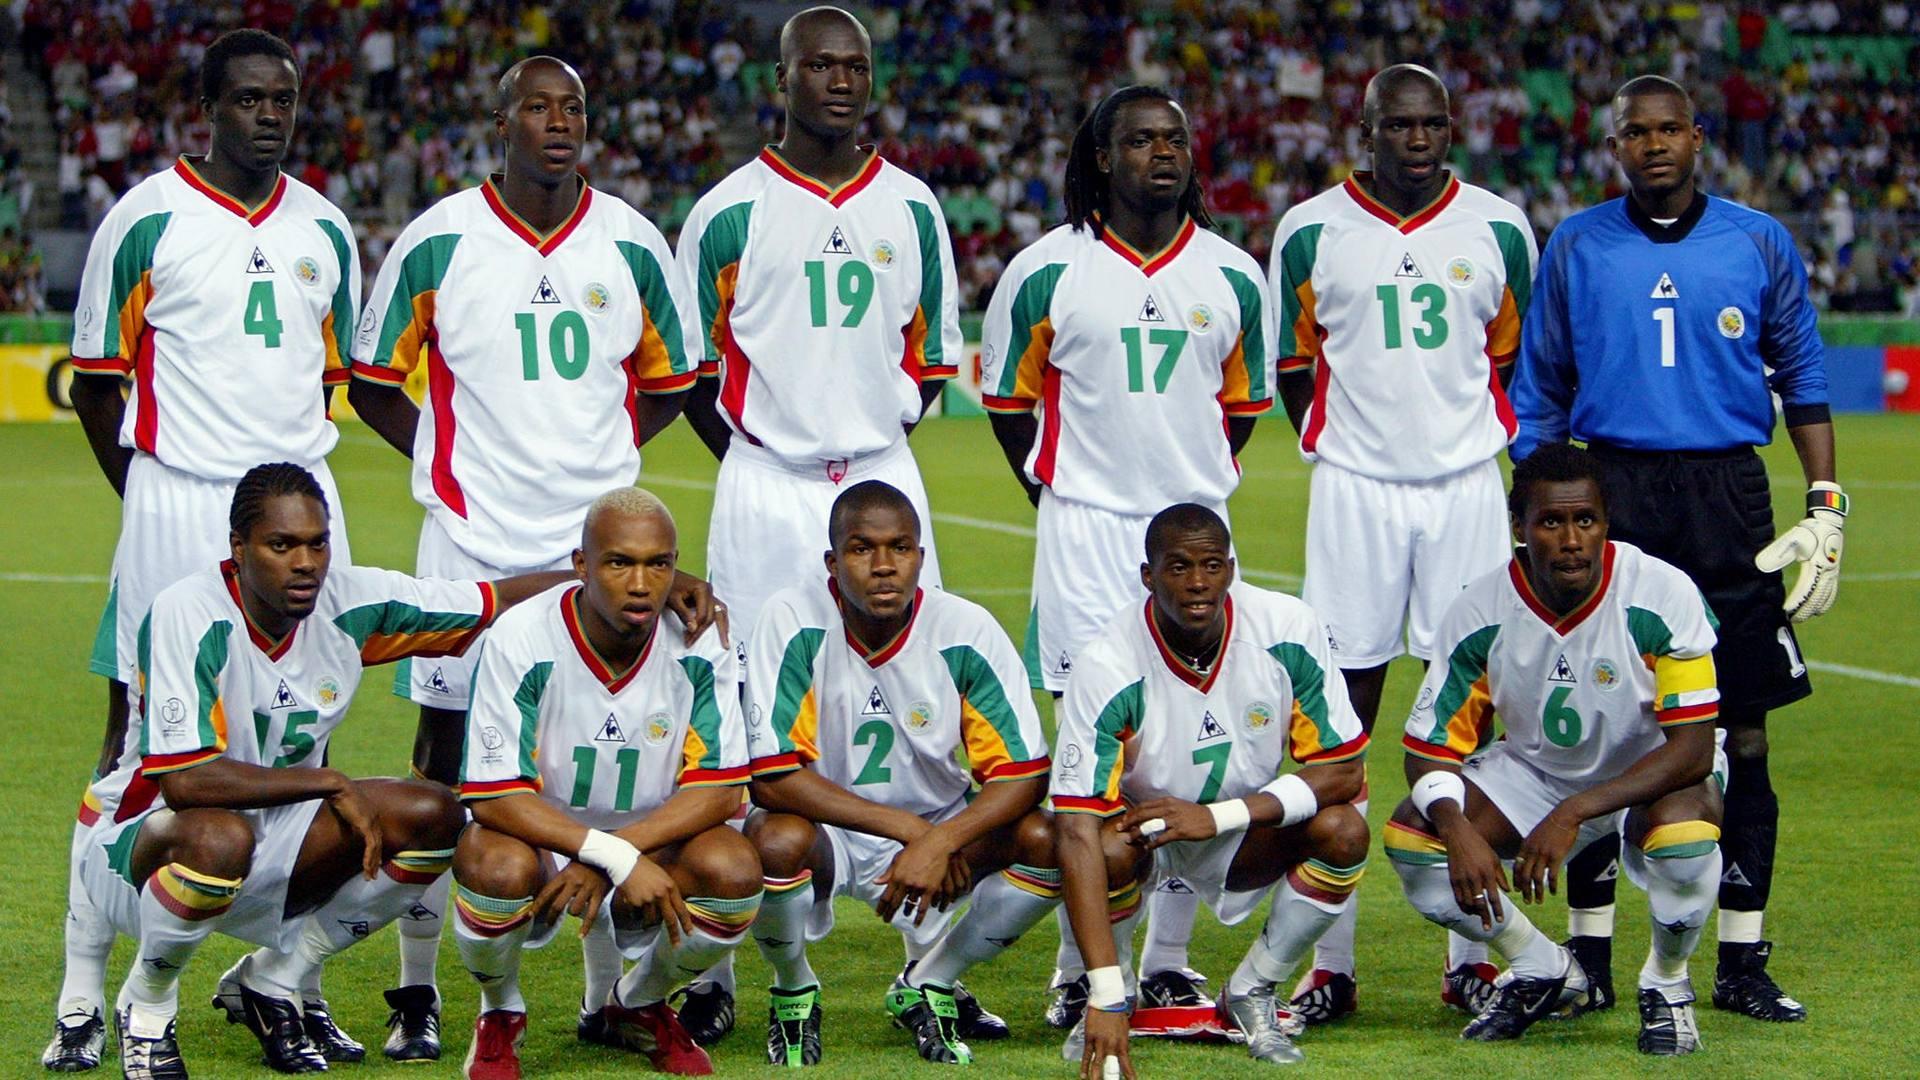 senegal-2002-world-cup_1ly1srlpxybye15b4aa25337tz.jpg